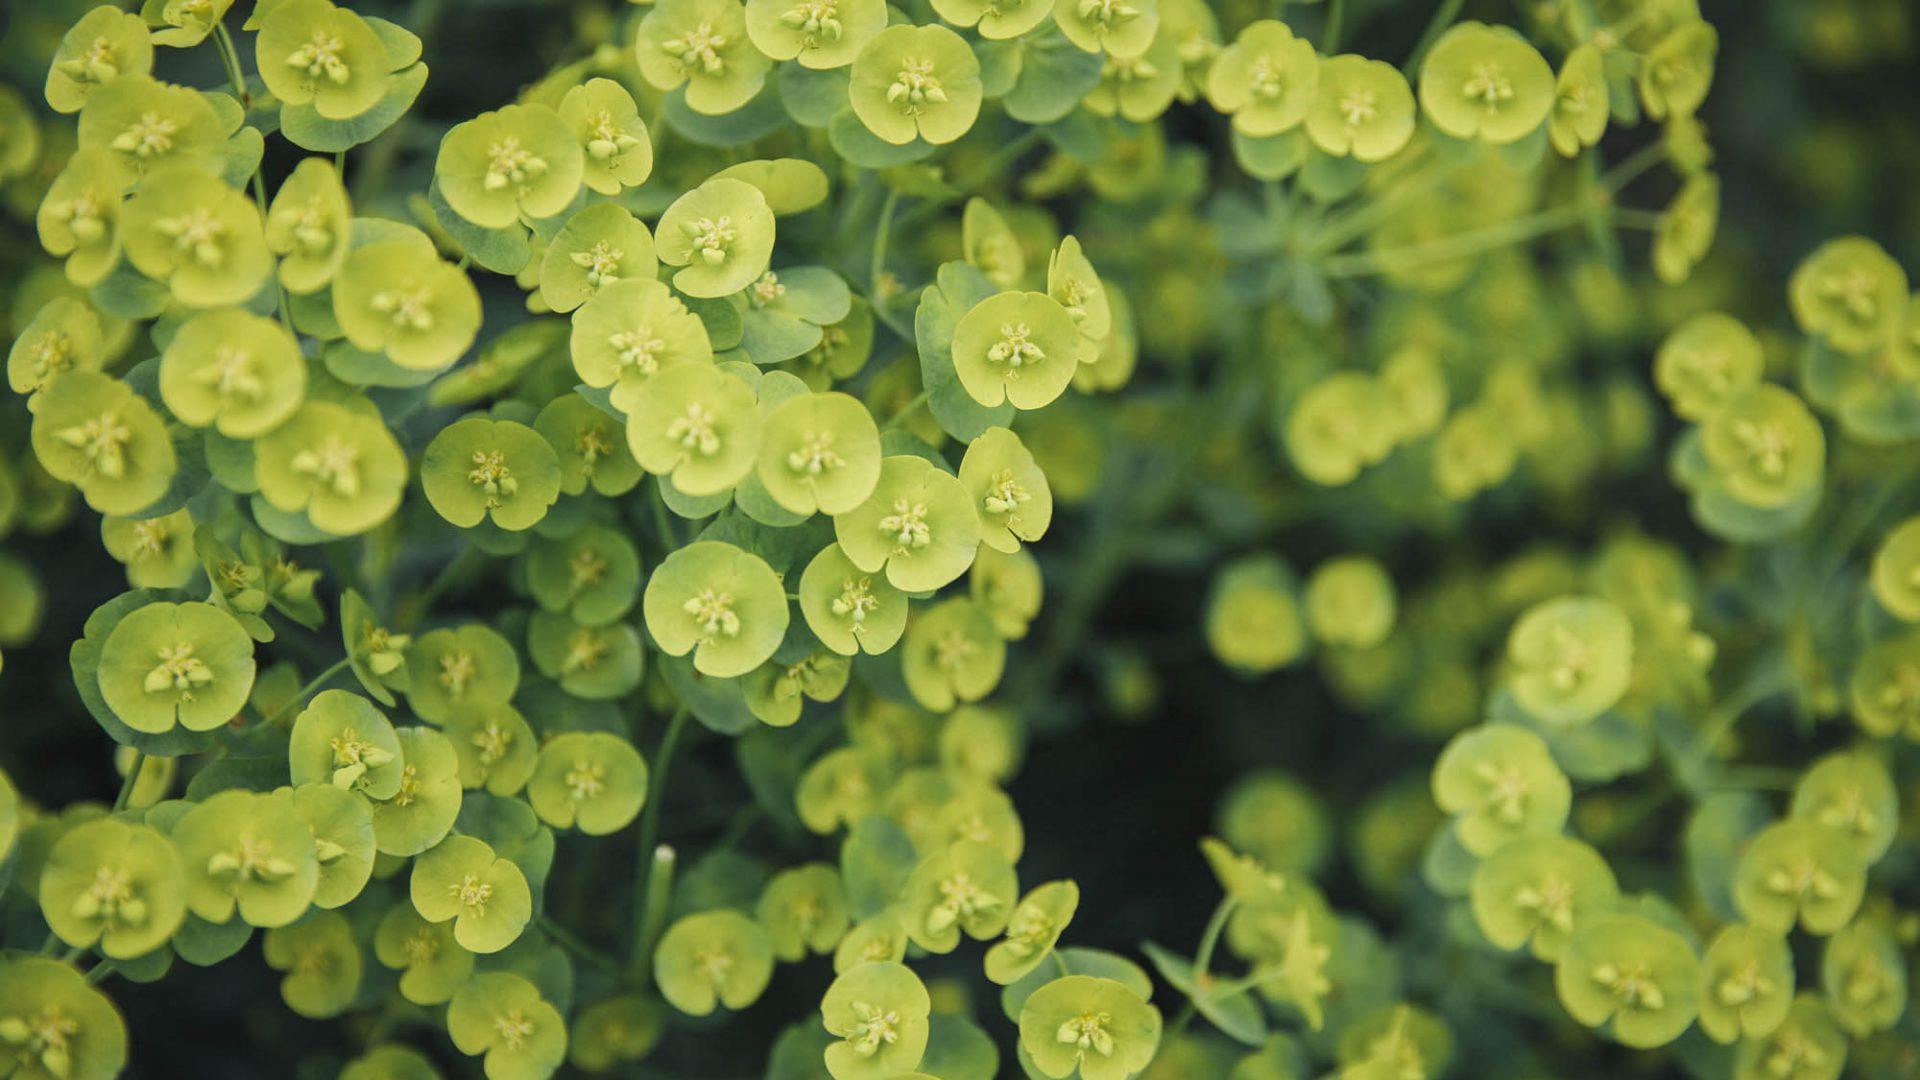 Closeup of plants